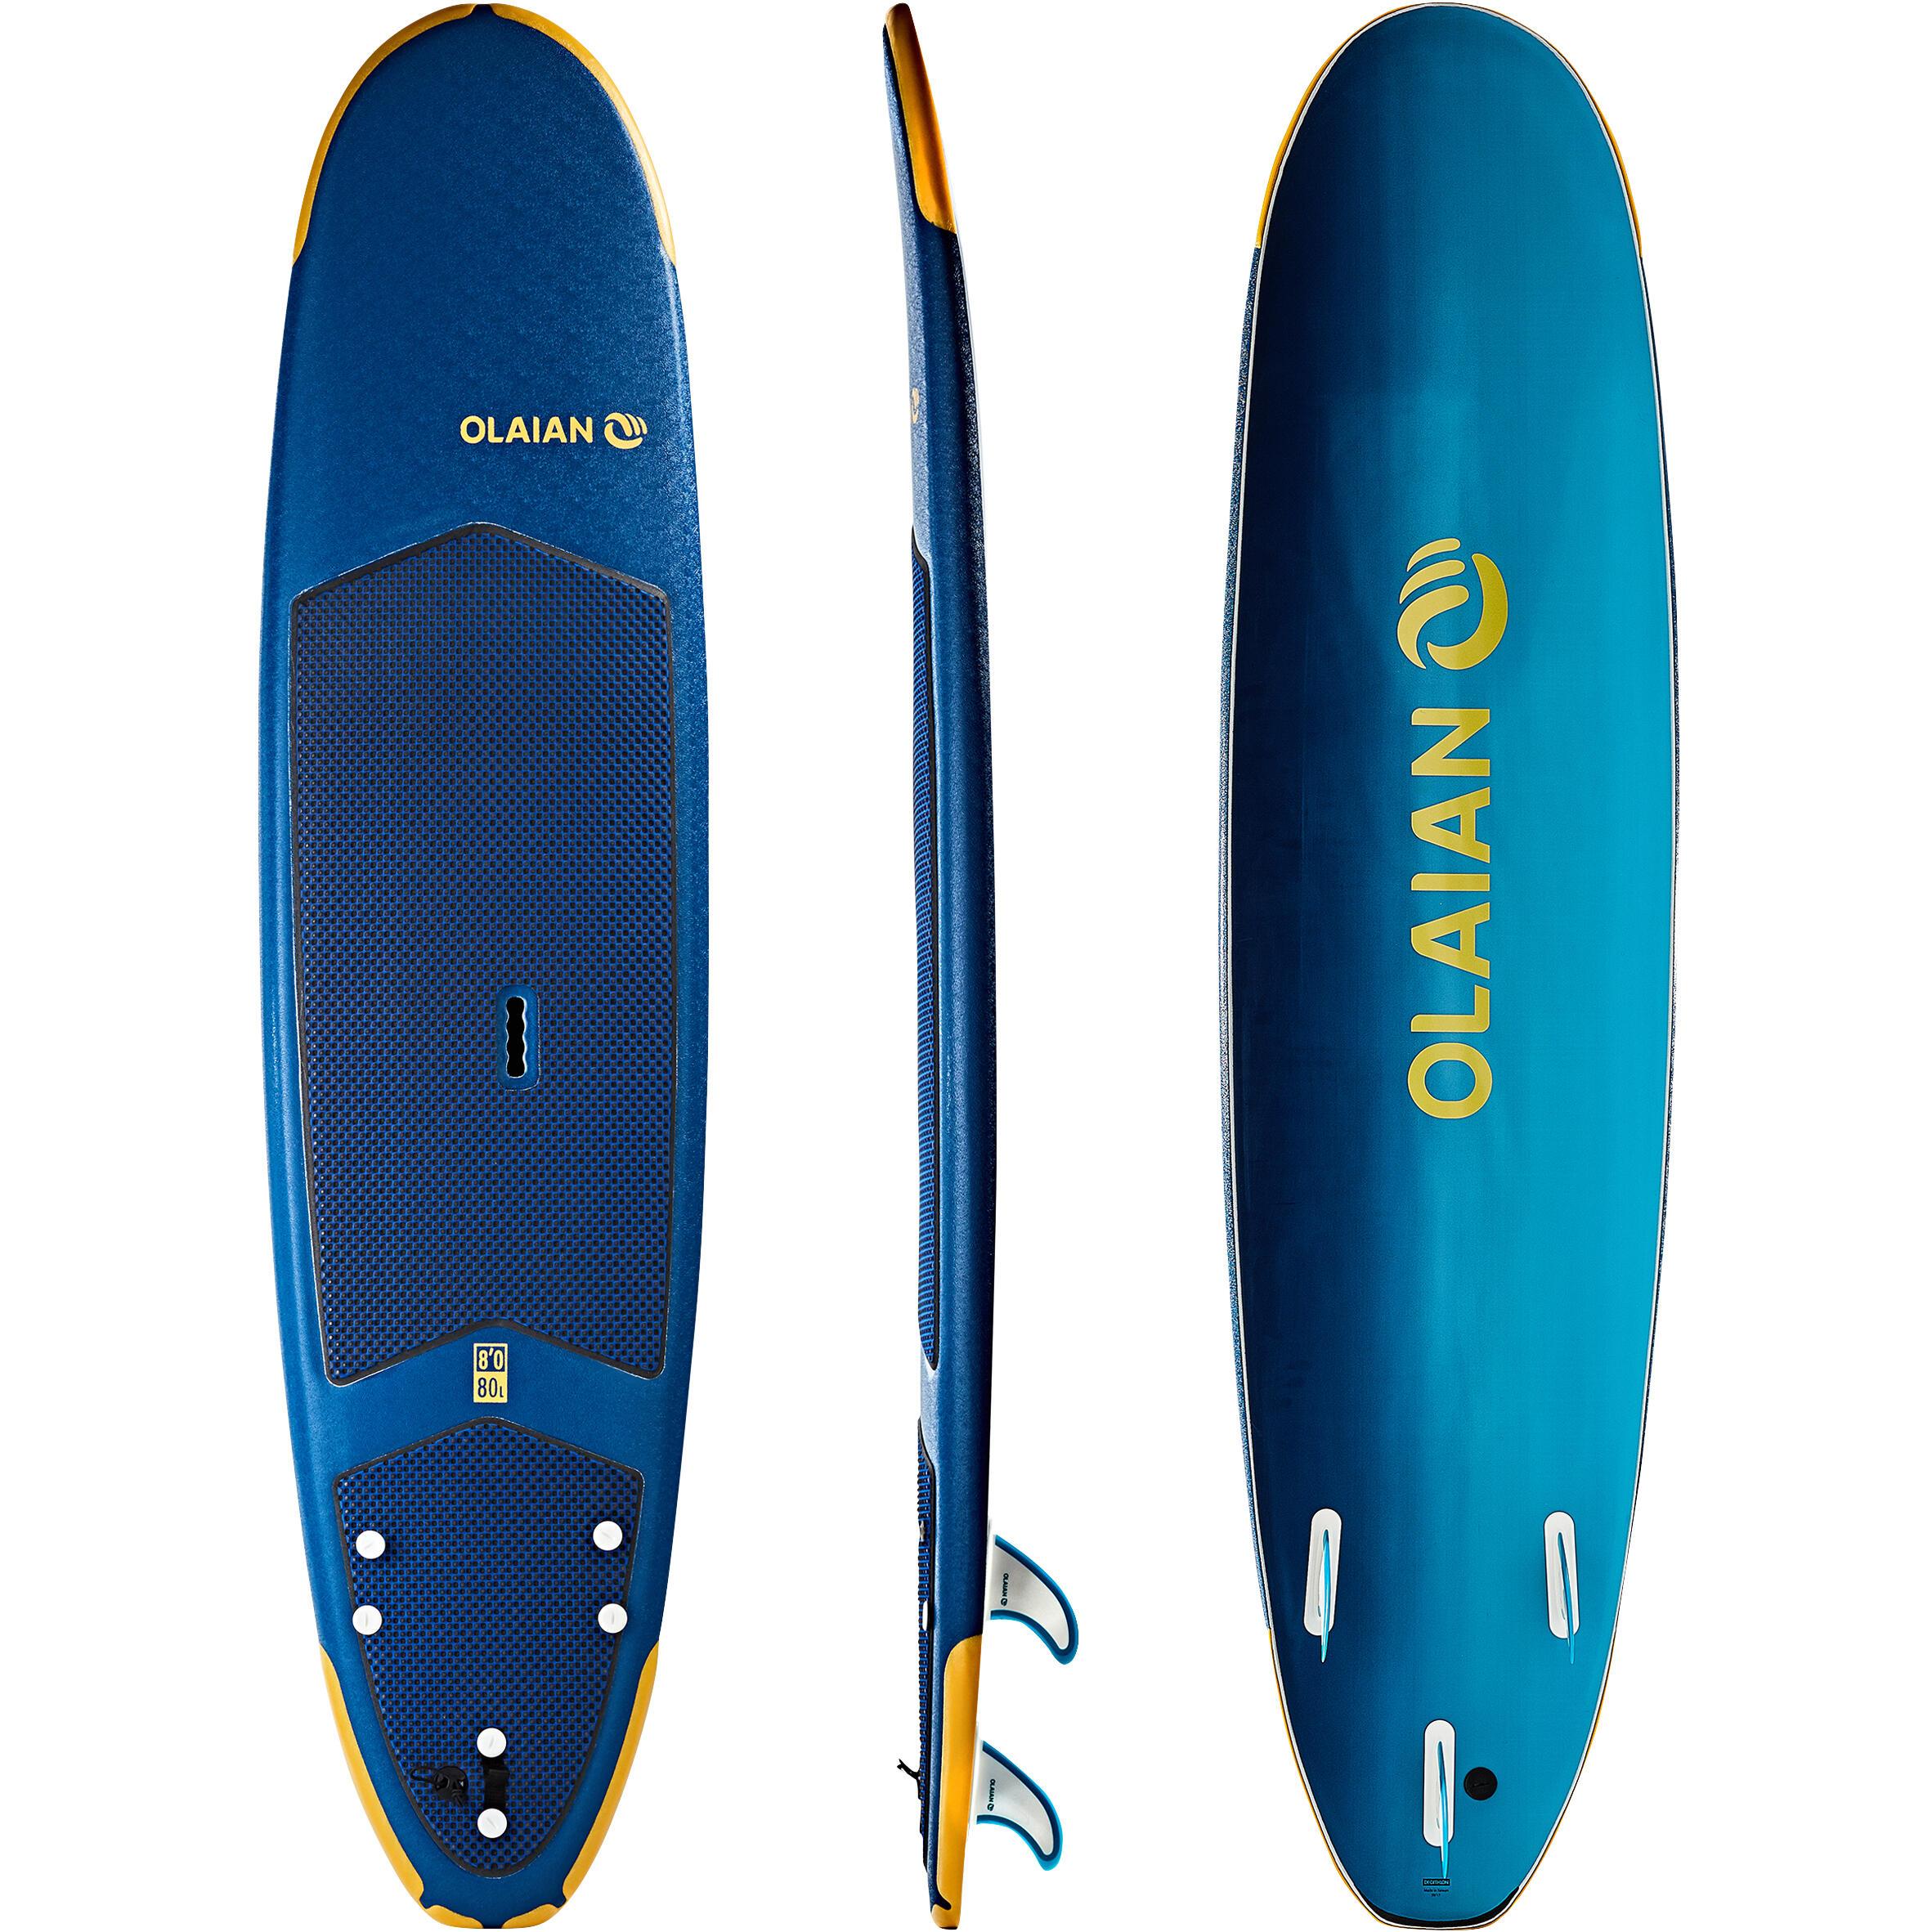 Placă Surf 500 8